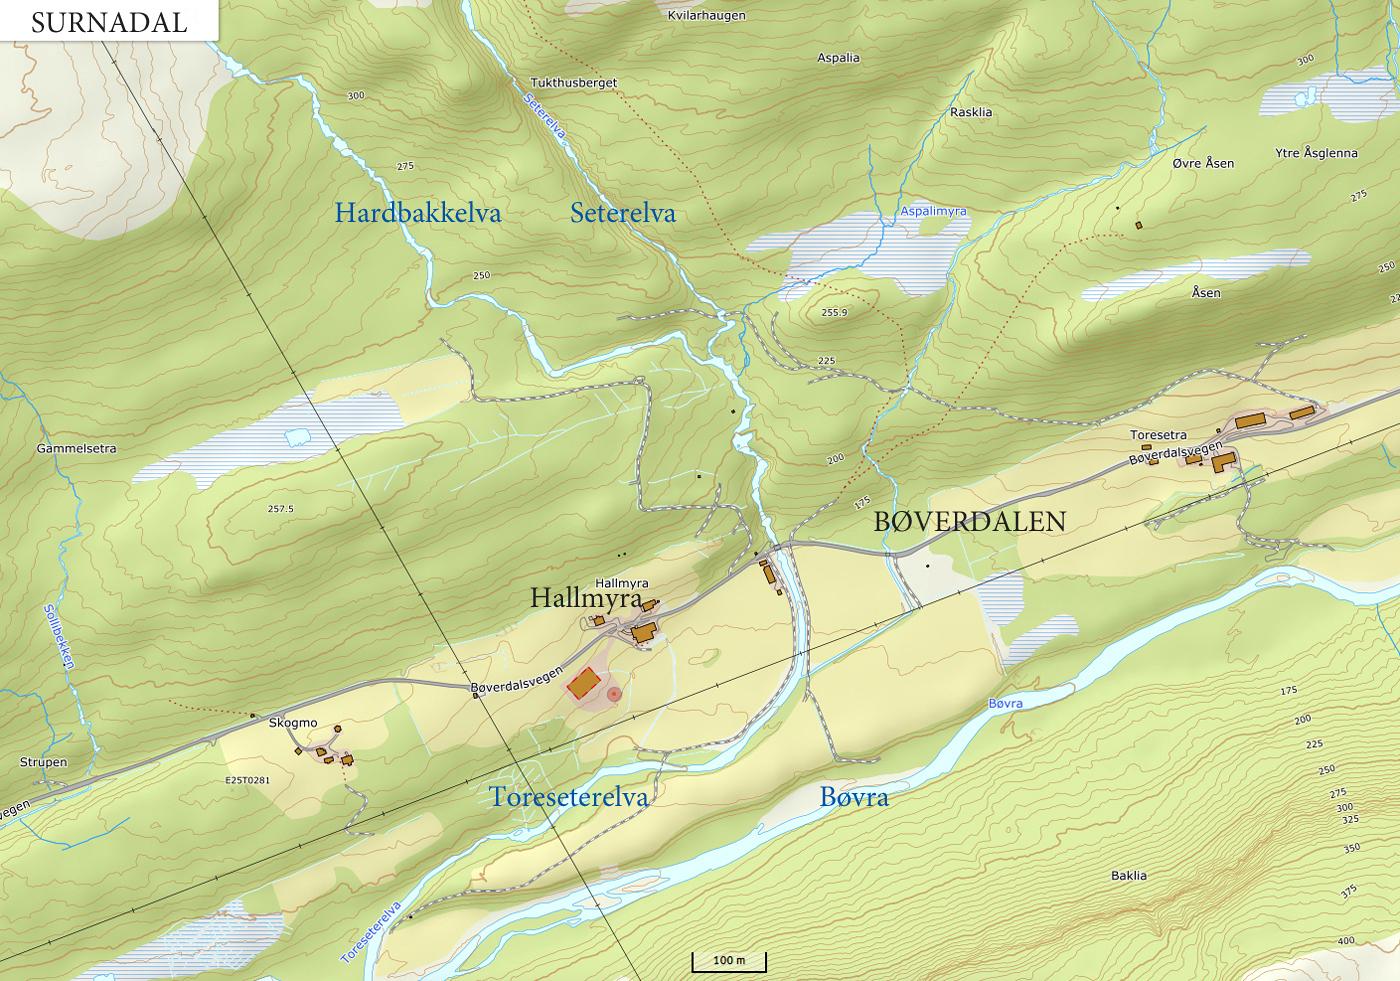 201110b-kart1.jpg